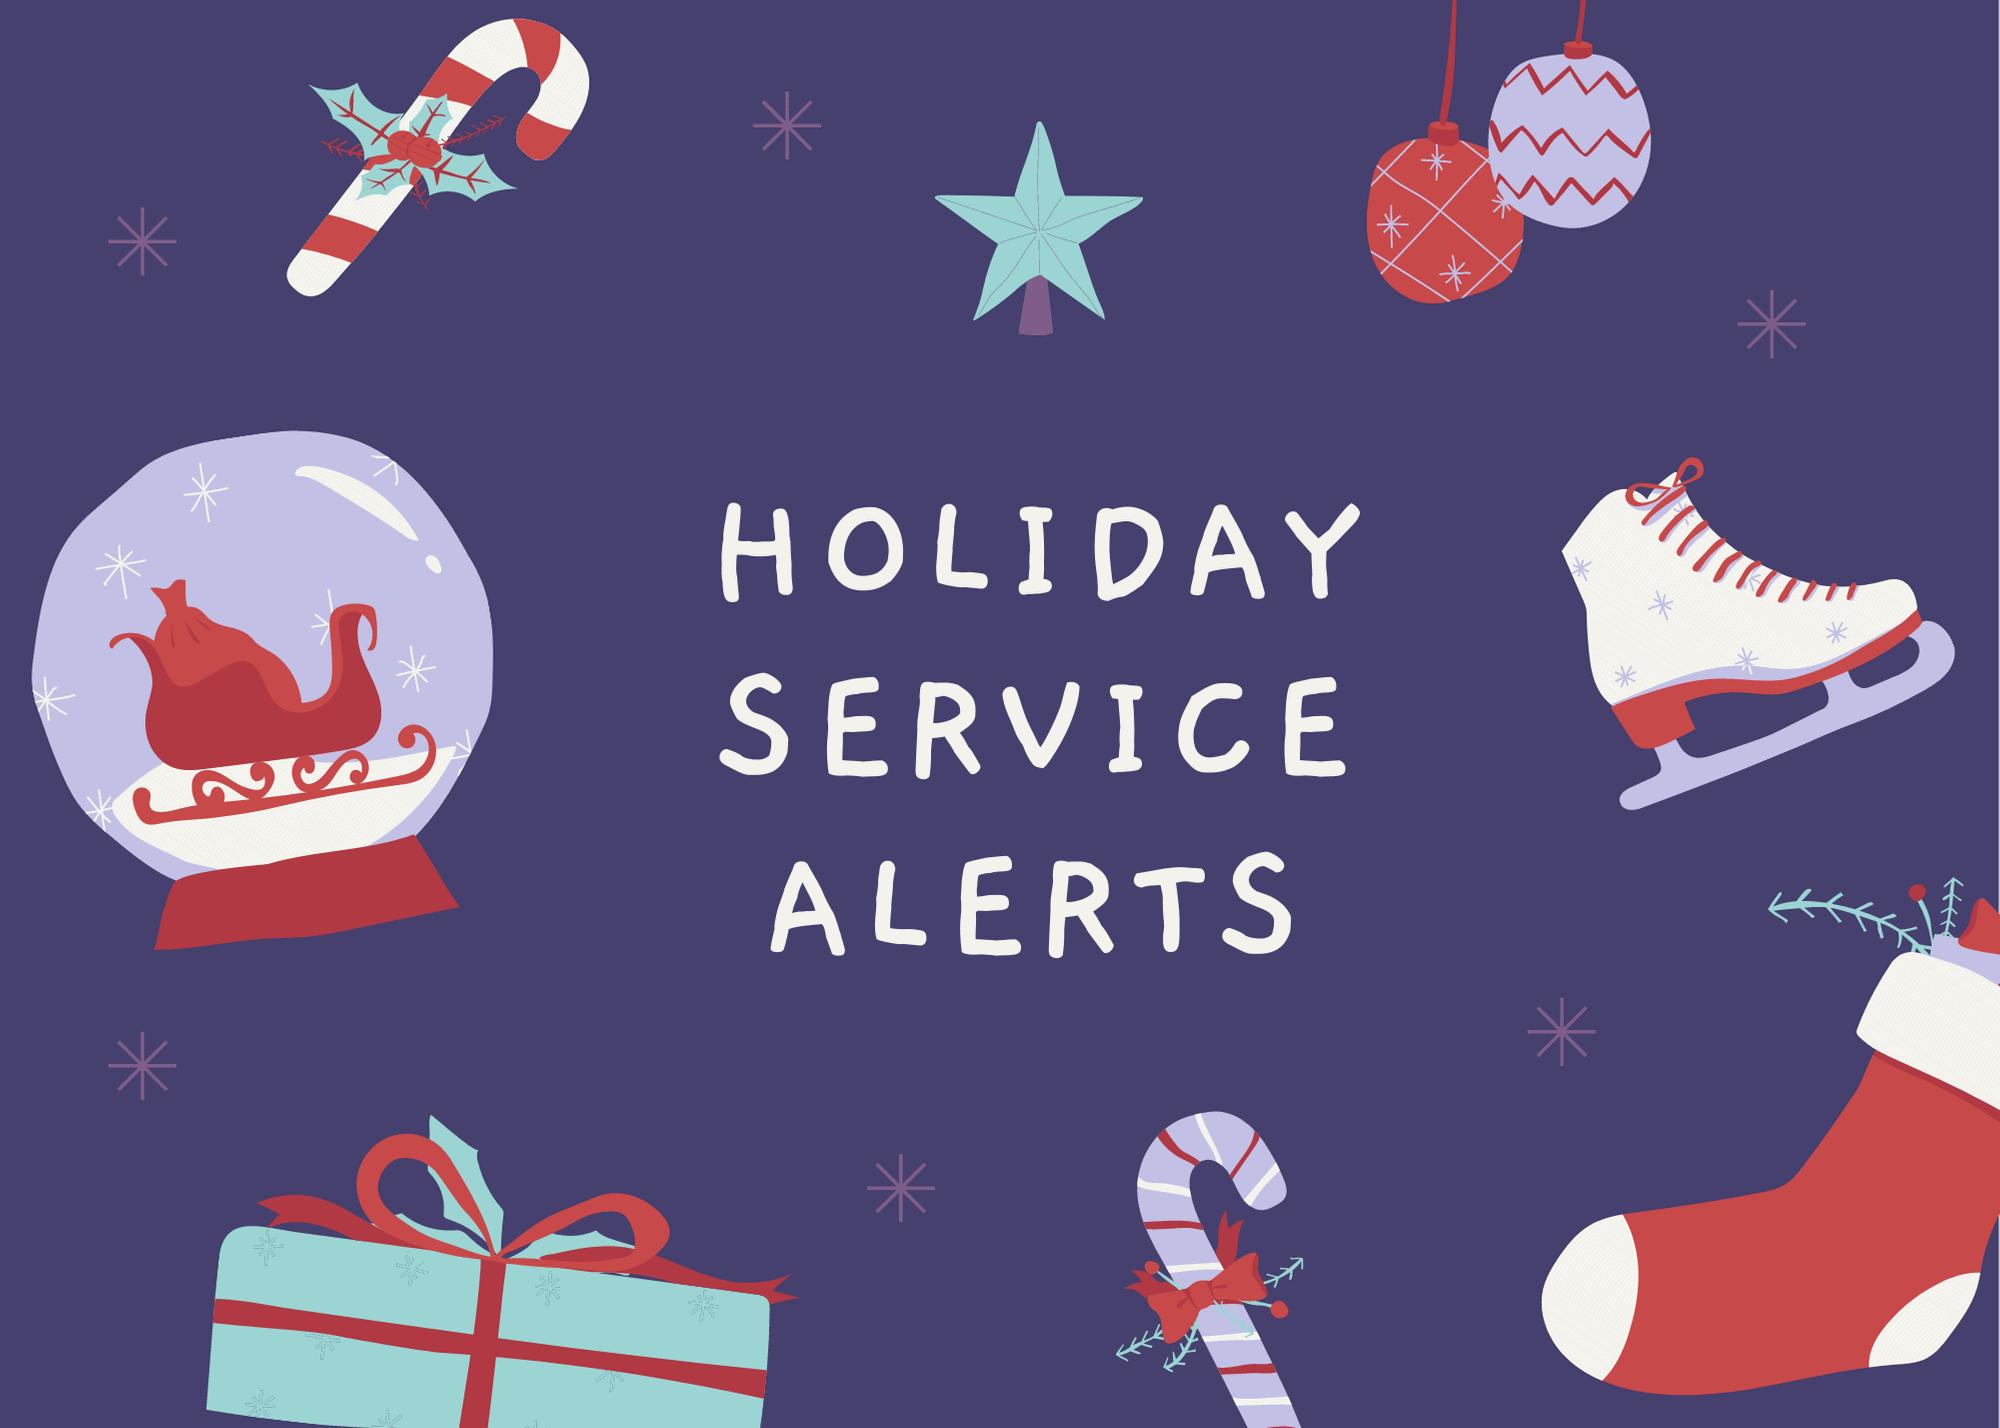 Service Alert: 2020-21 Holiday Schedules